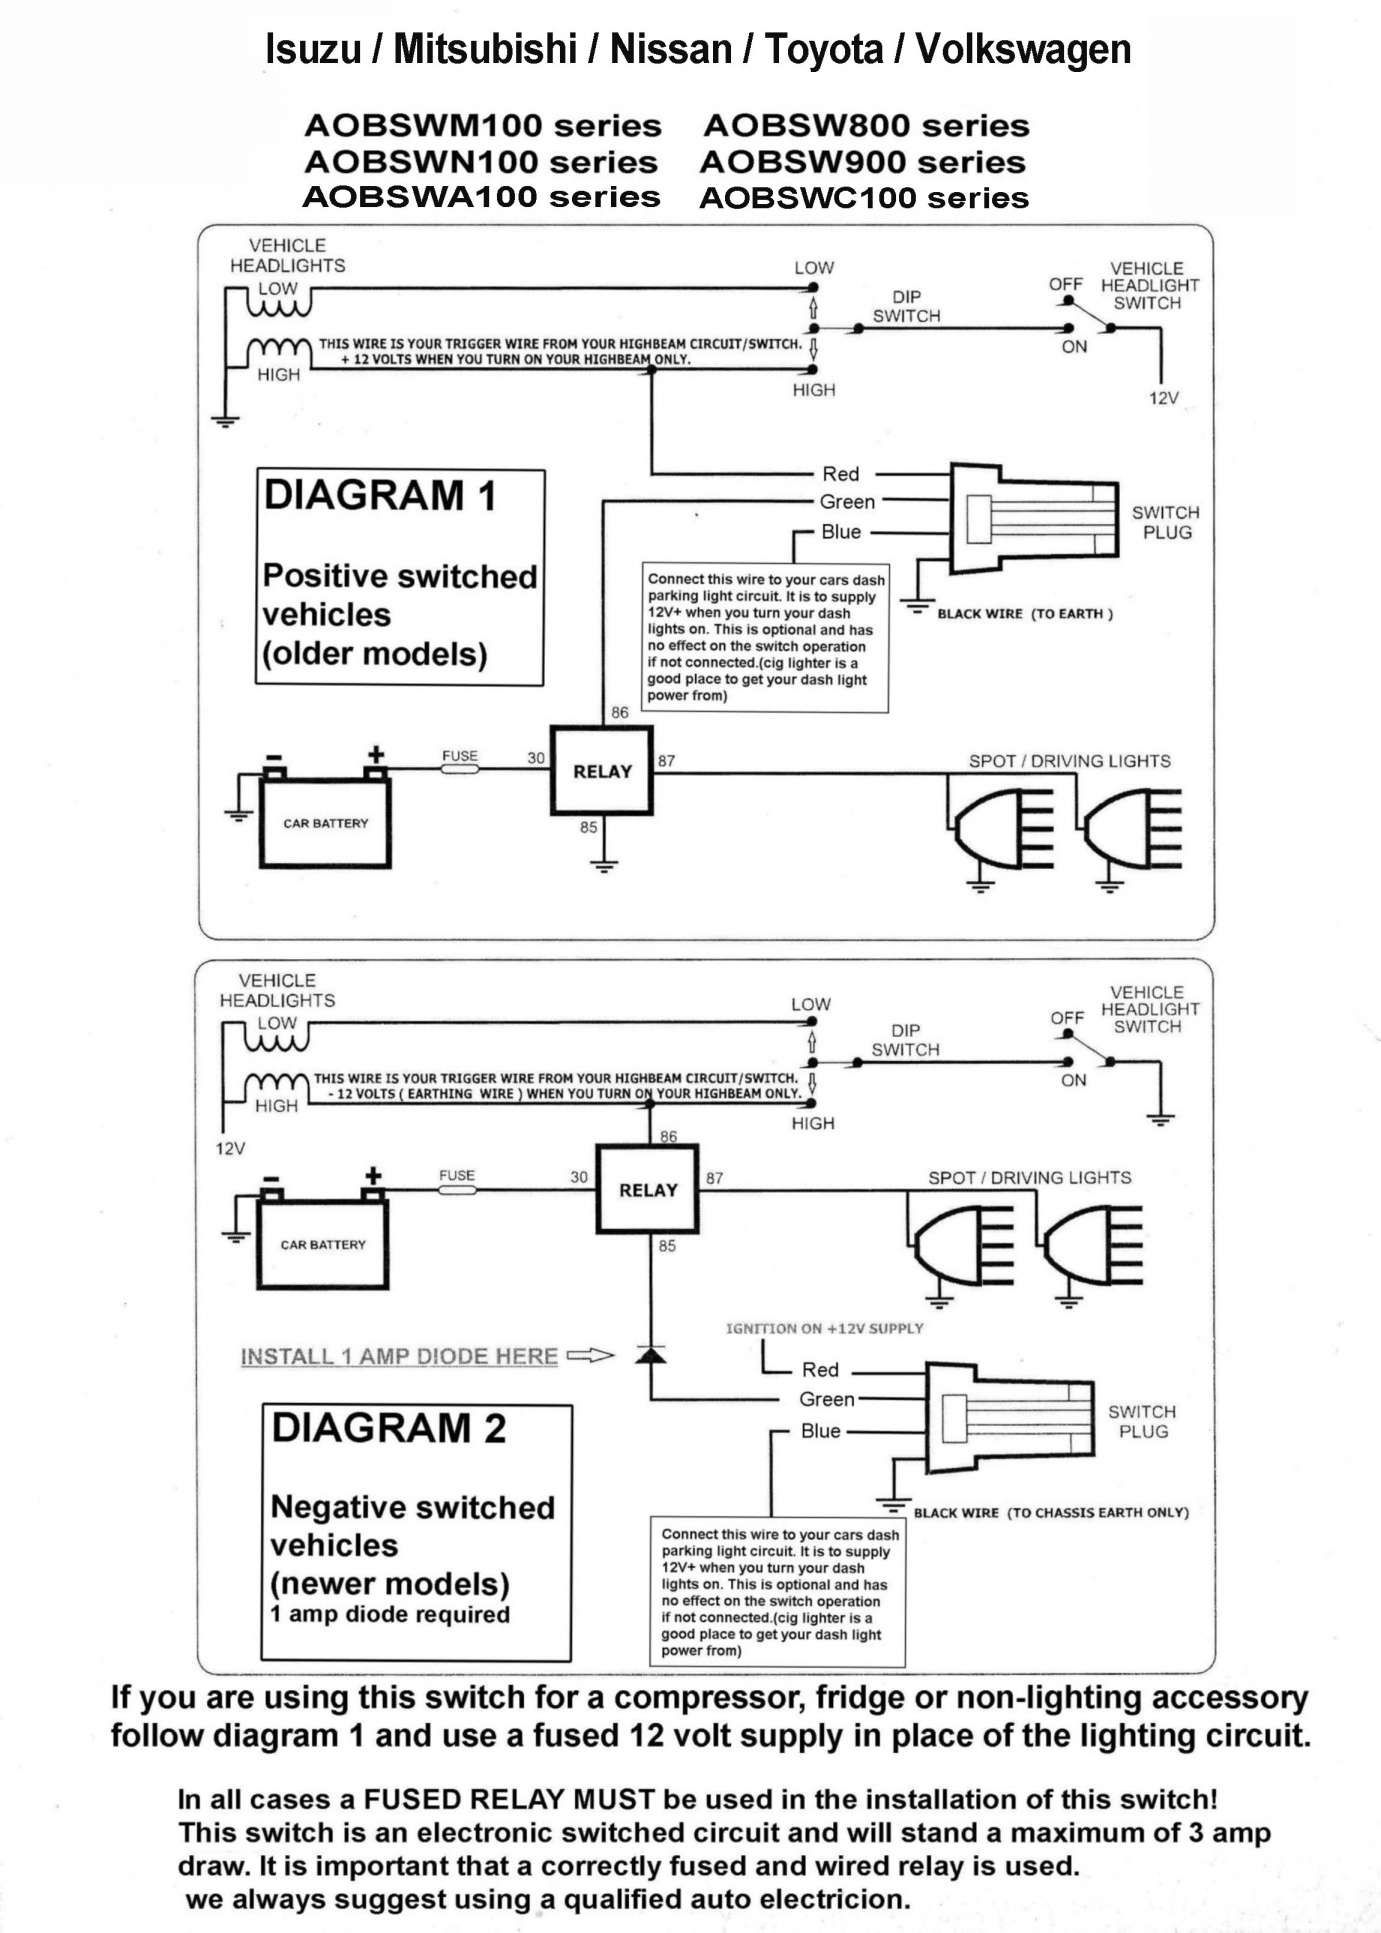 2004 Nissan Titan Radio Wiring Diagram